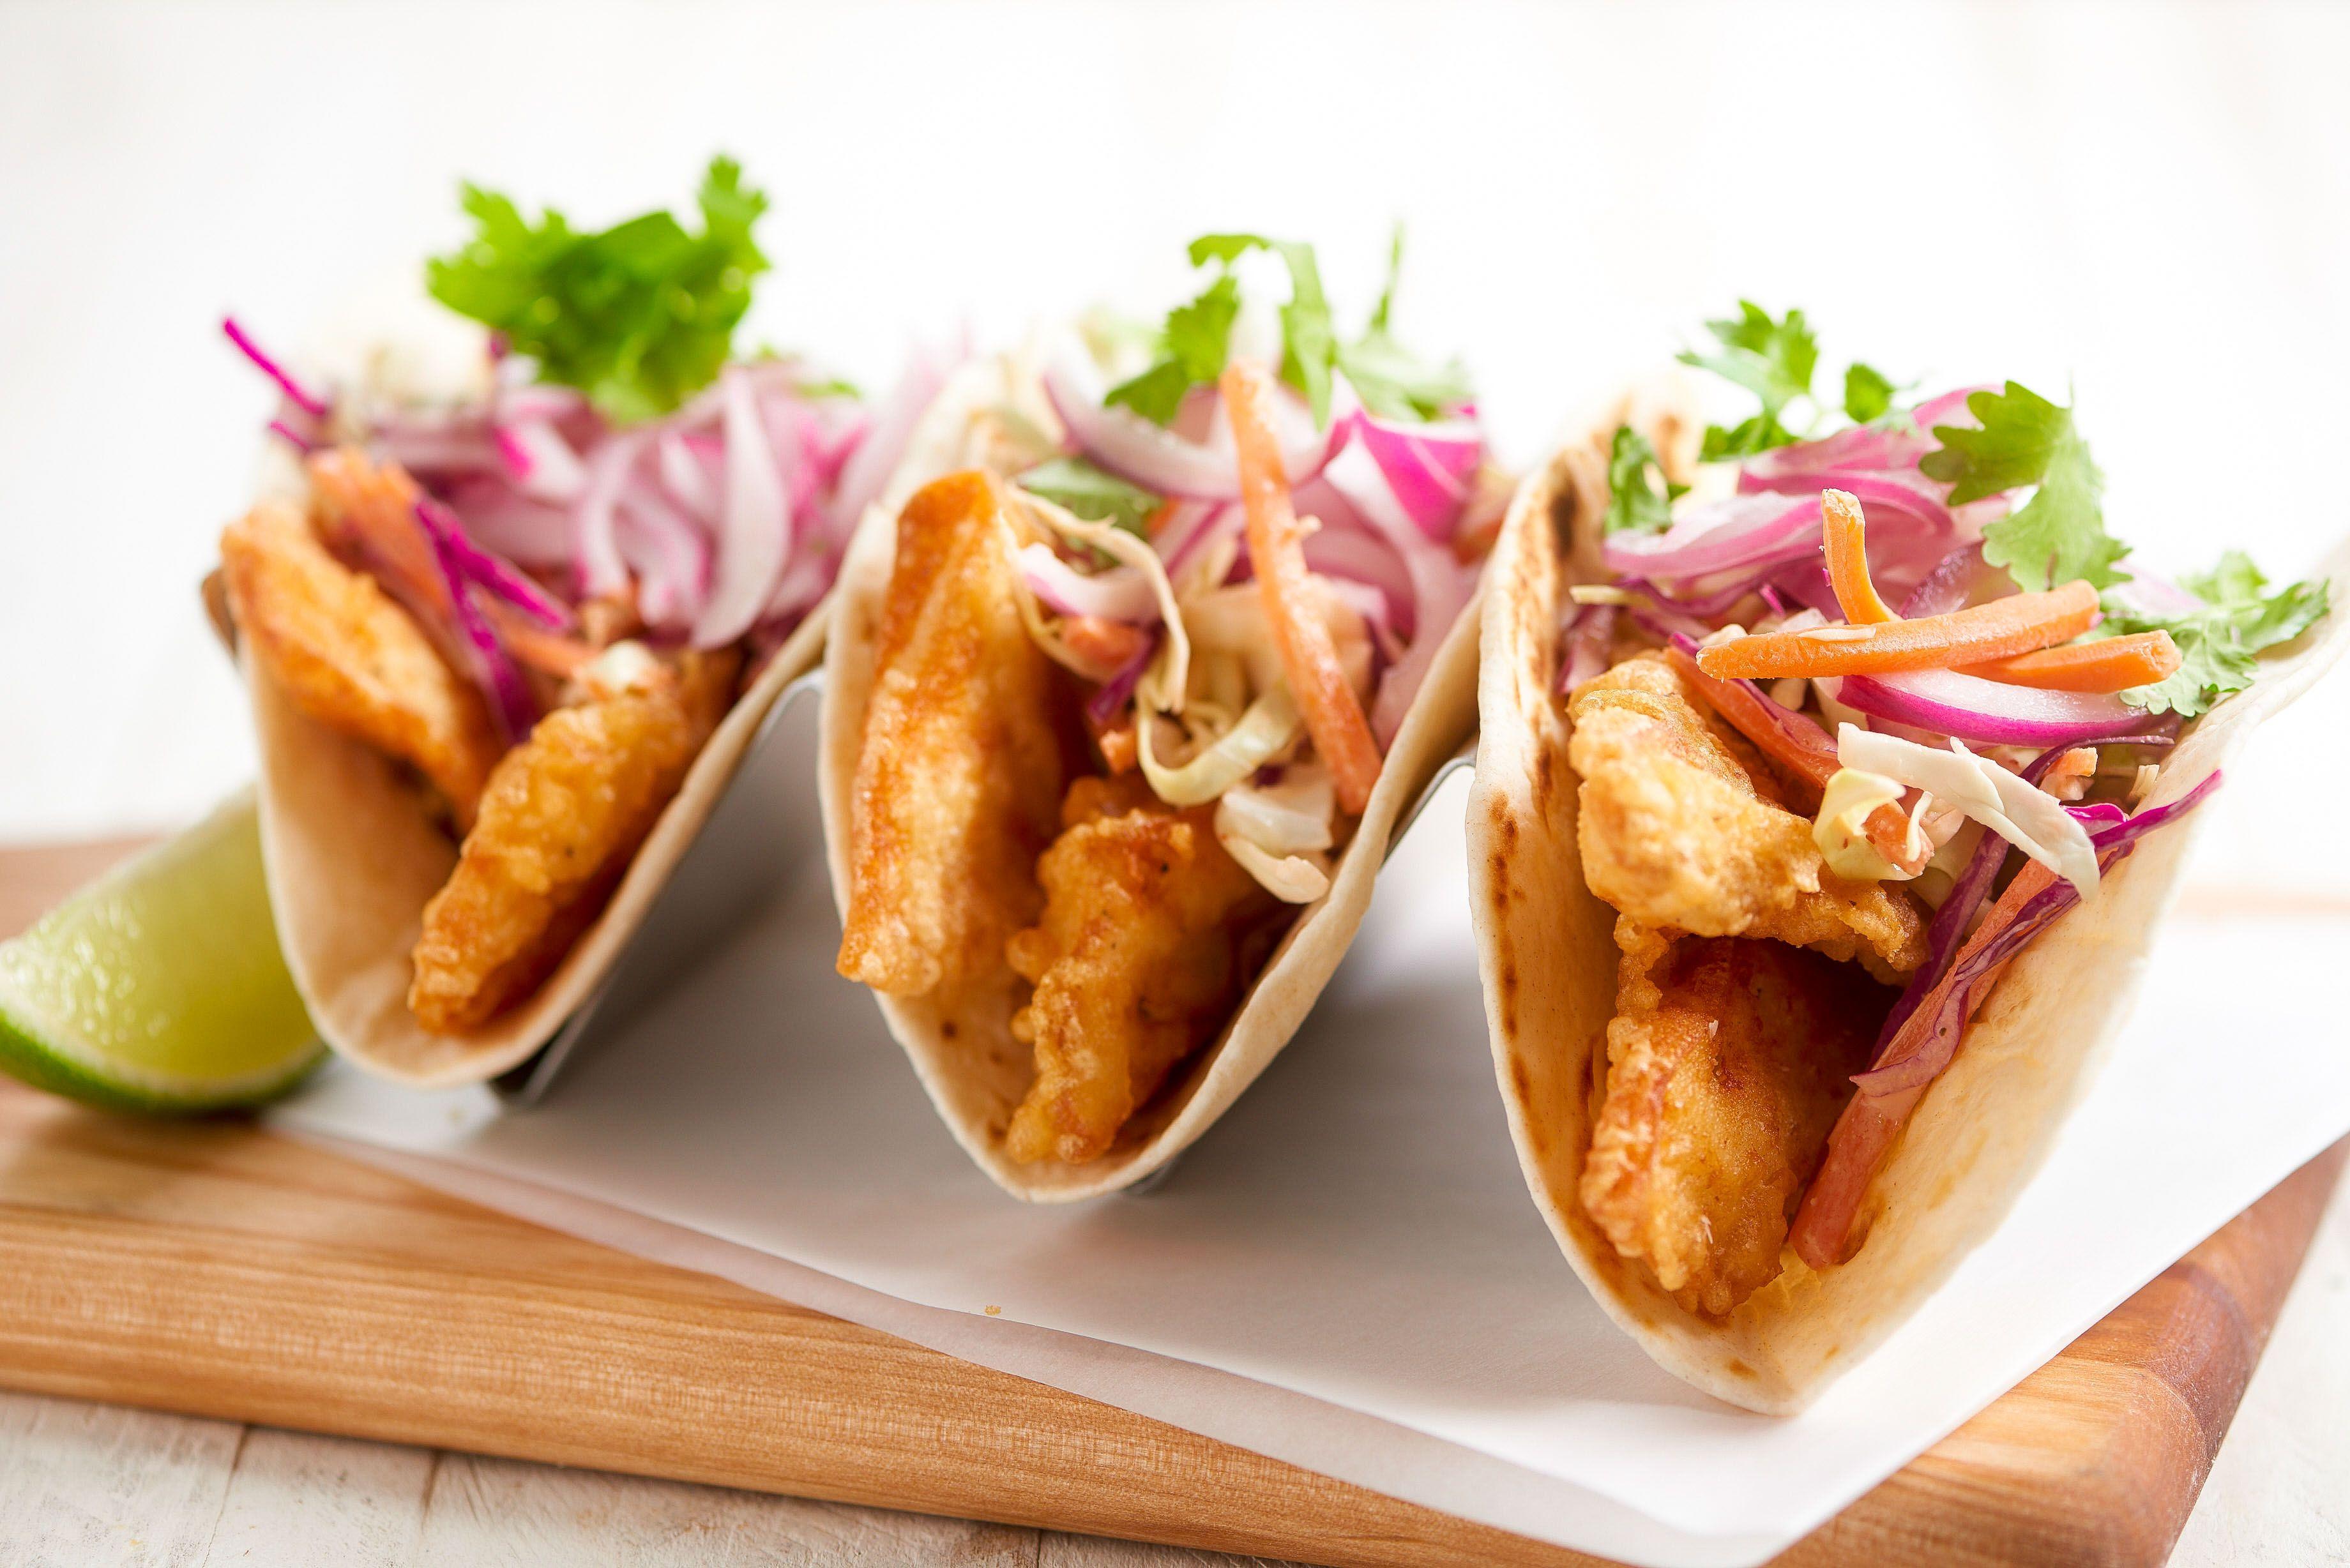 Baja Fish Tacos with Sriracha slaw and pickled onion